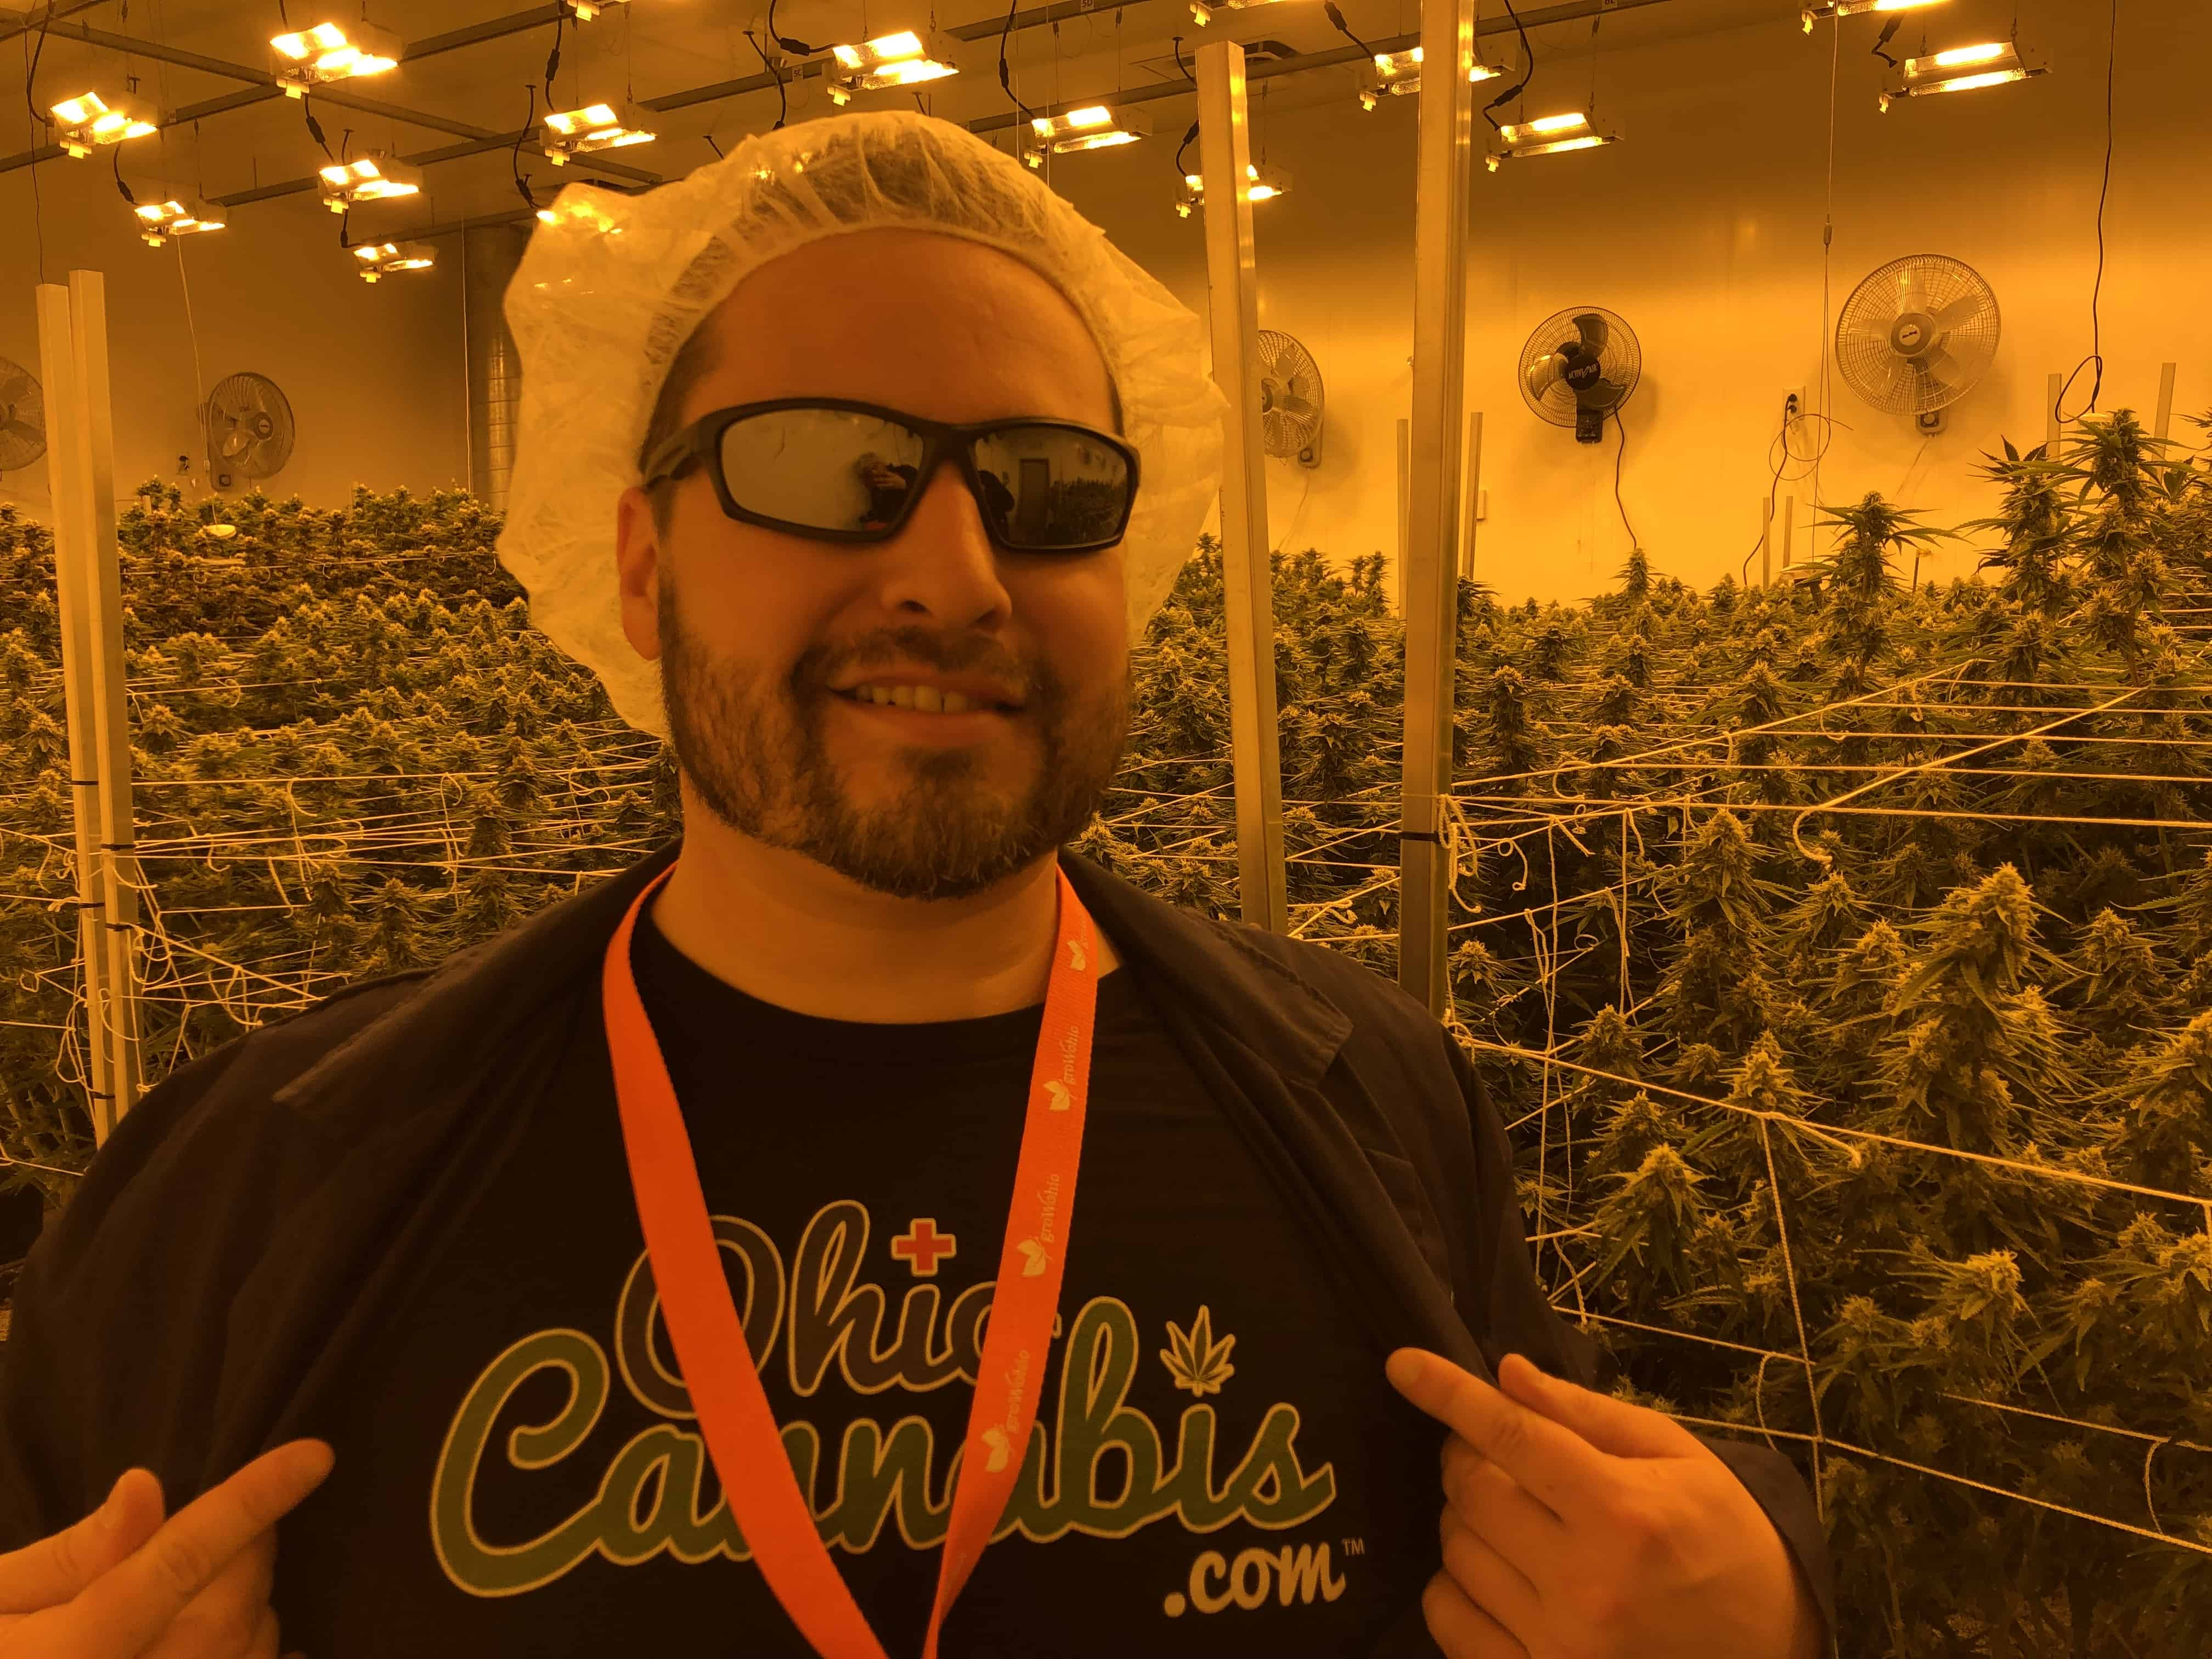 Johnny at GrowOhio Flower Room